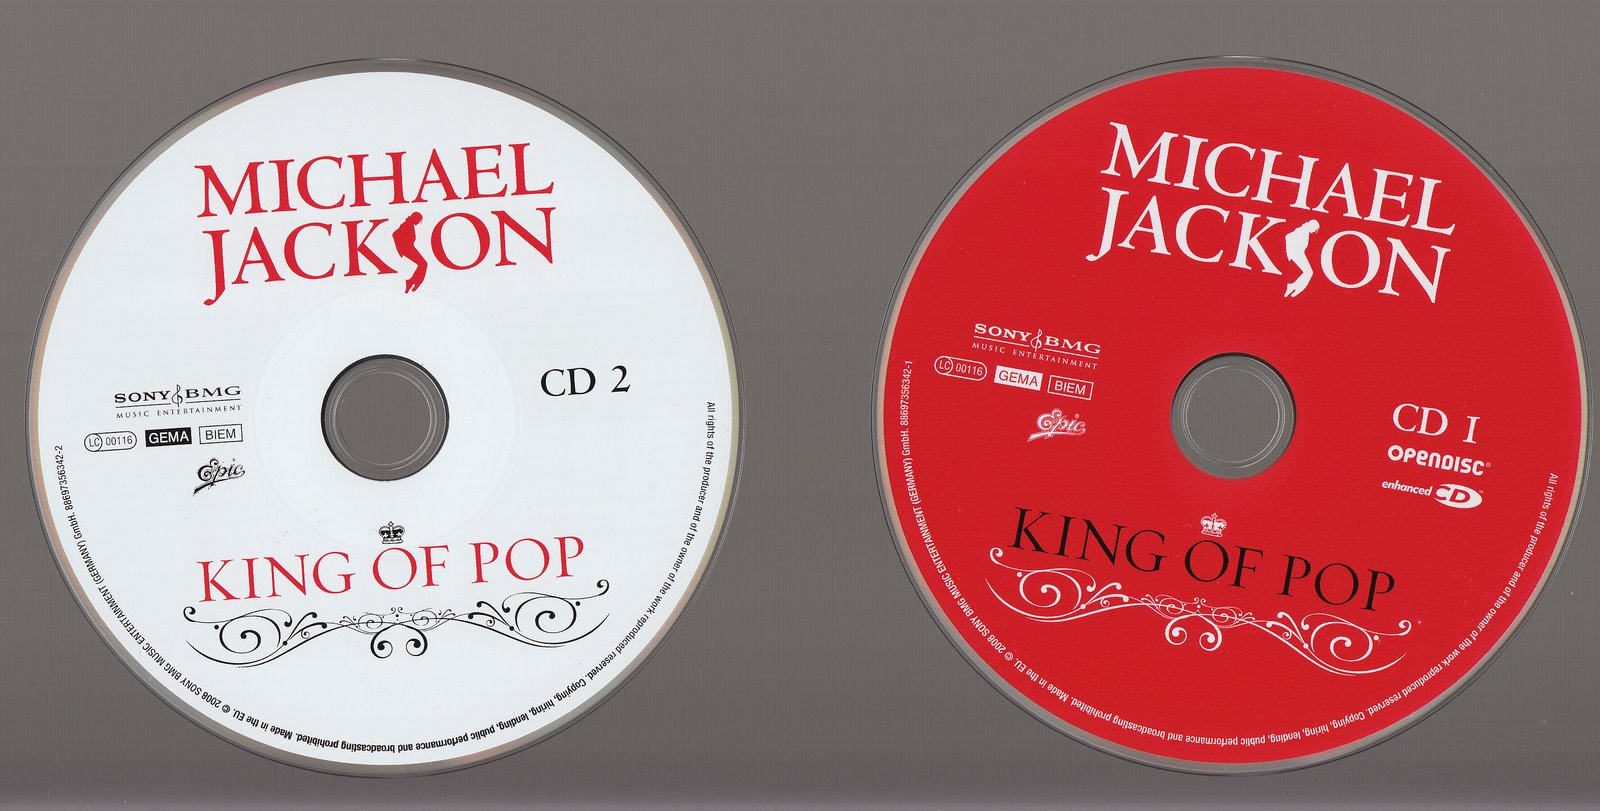 http://1.bp.blogspot.com/_fI5zfeCckEs/SRcp_PgjdII/AAAAAAAAIIA/MVGO3BwJizQ/s1600/000-michael_jackson_-_king_of_pop-2cd-2008-cds.jpg